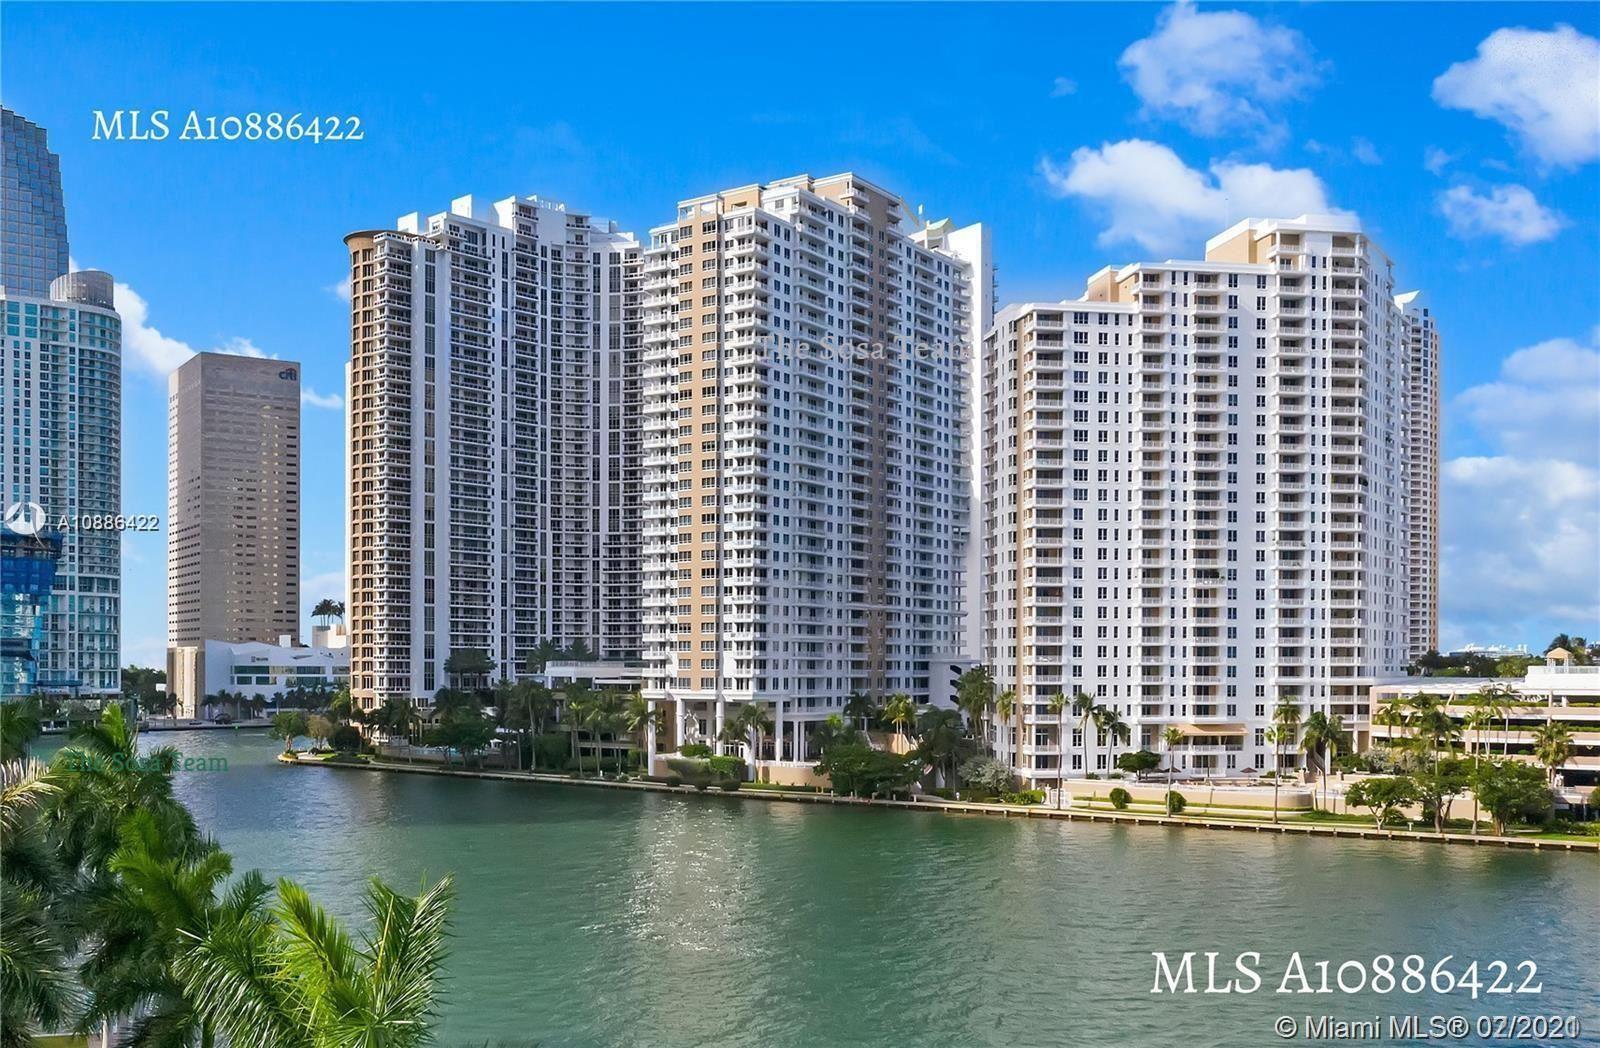 801 Brickell Key Blvd #2510, Miami, FL 33131 - #: A10886422